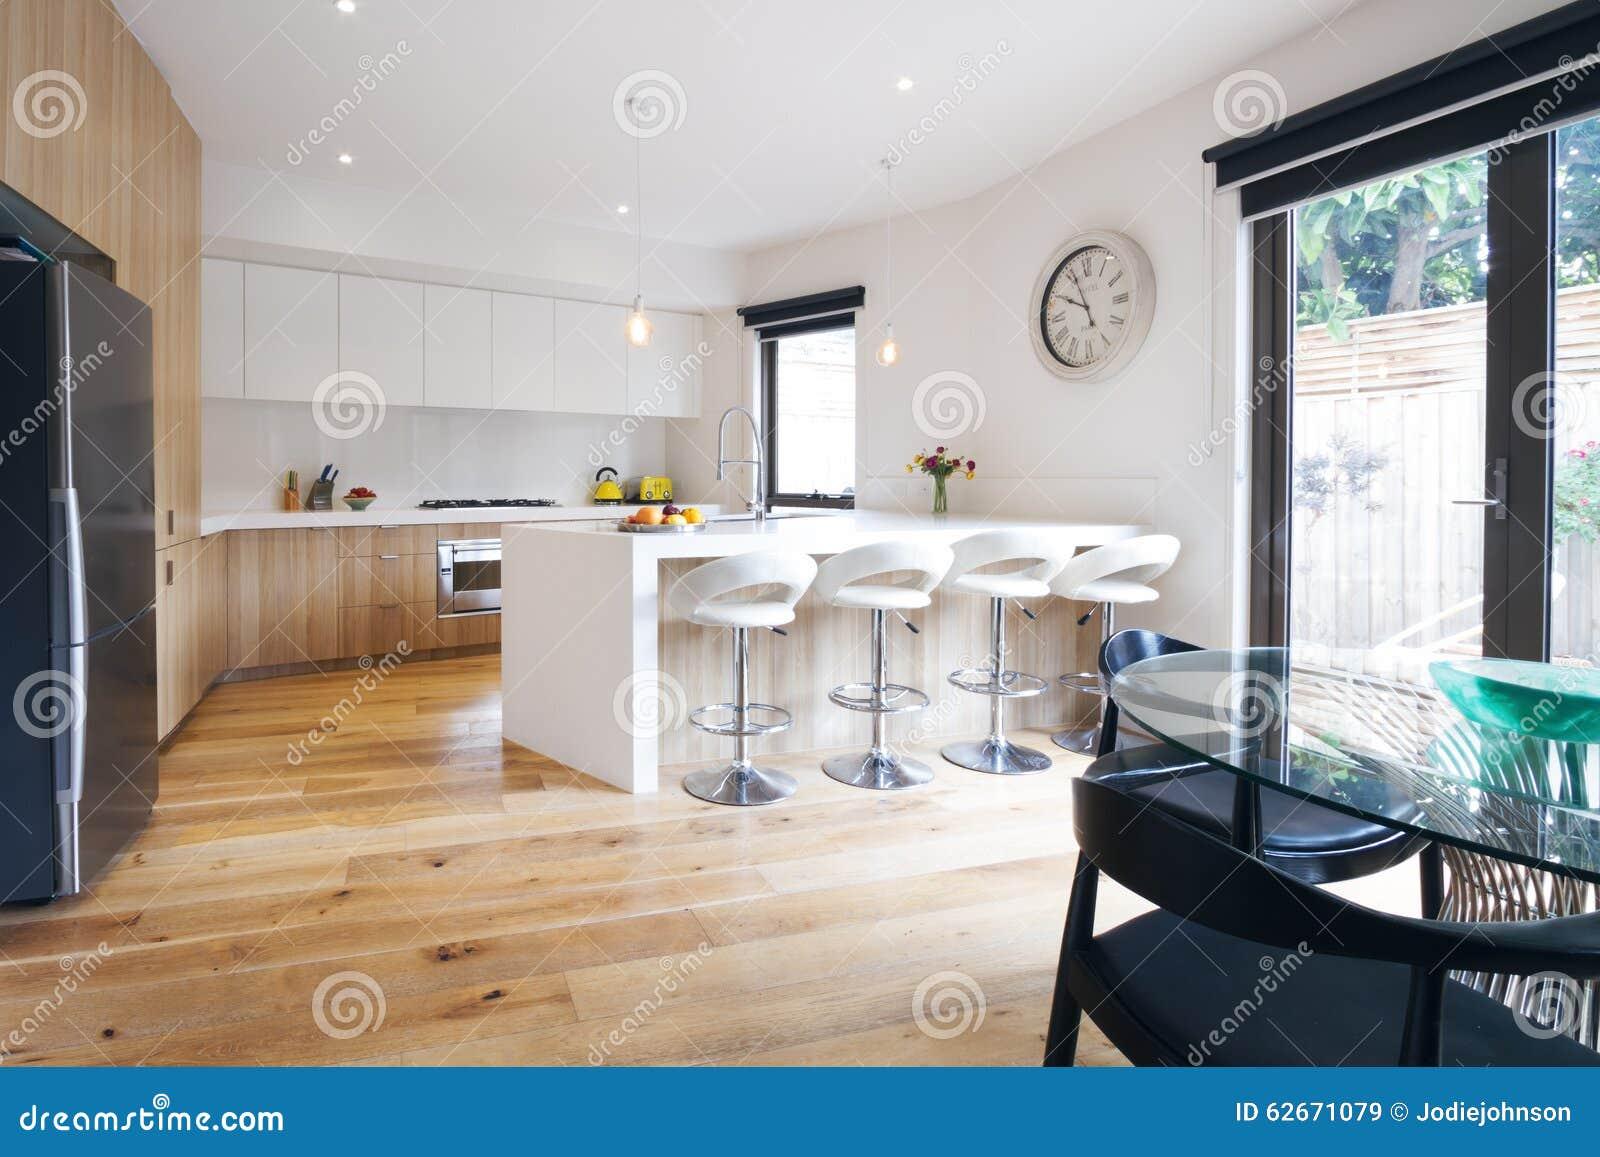 Modern Open Plan Kitchen With Island Bench Stock Photo